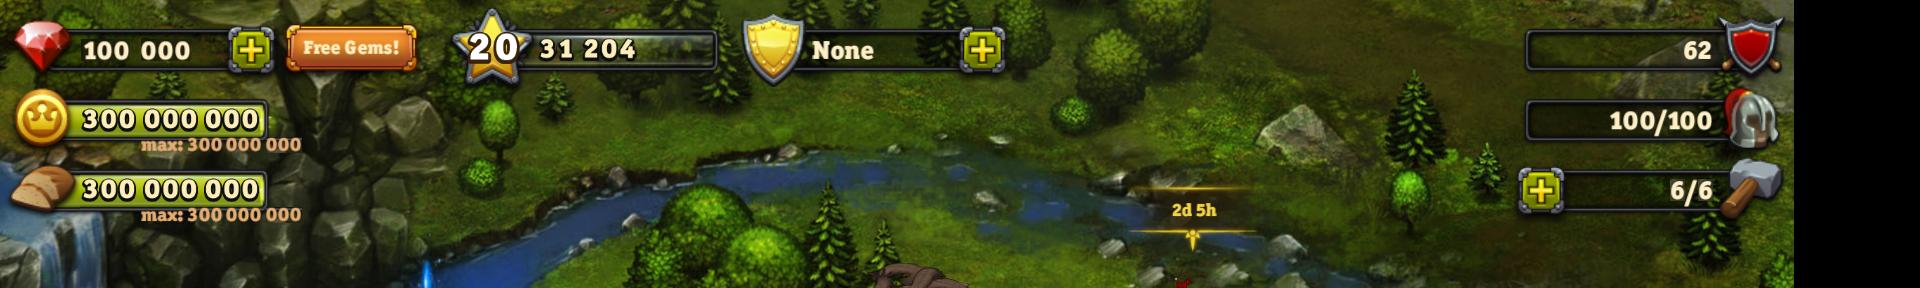 Throne Rush Hack Unlimited Gems